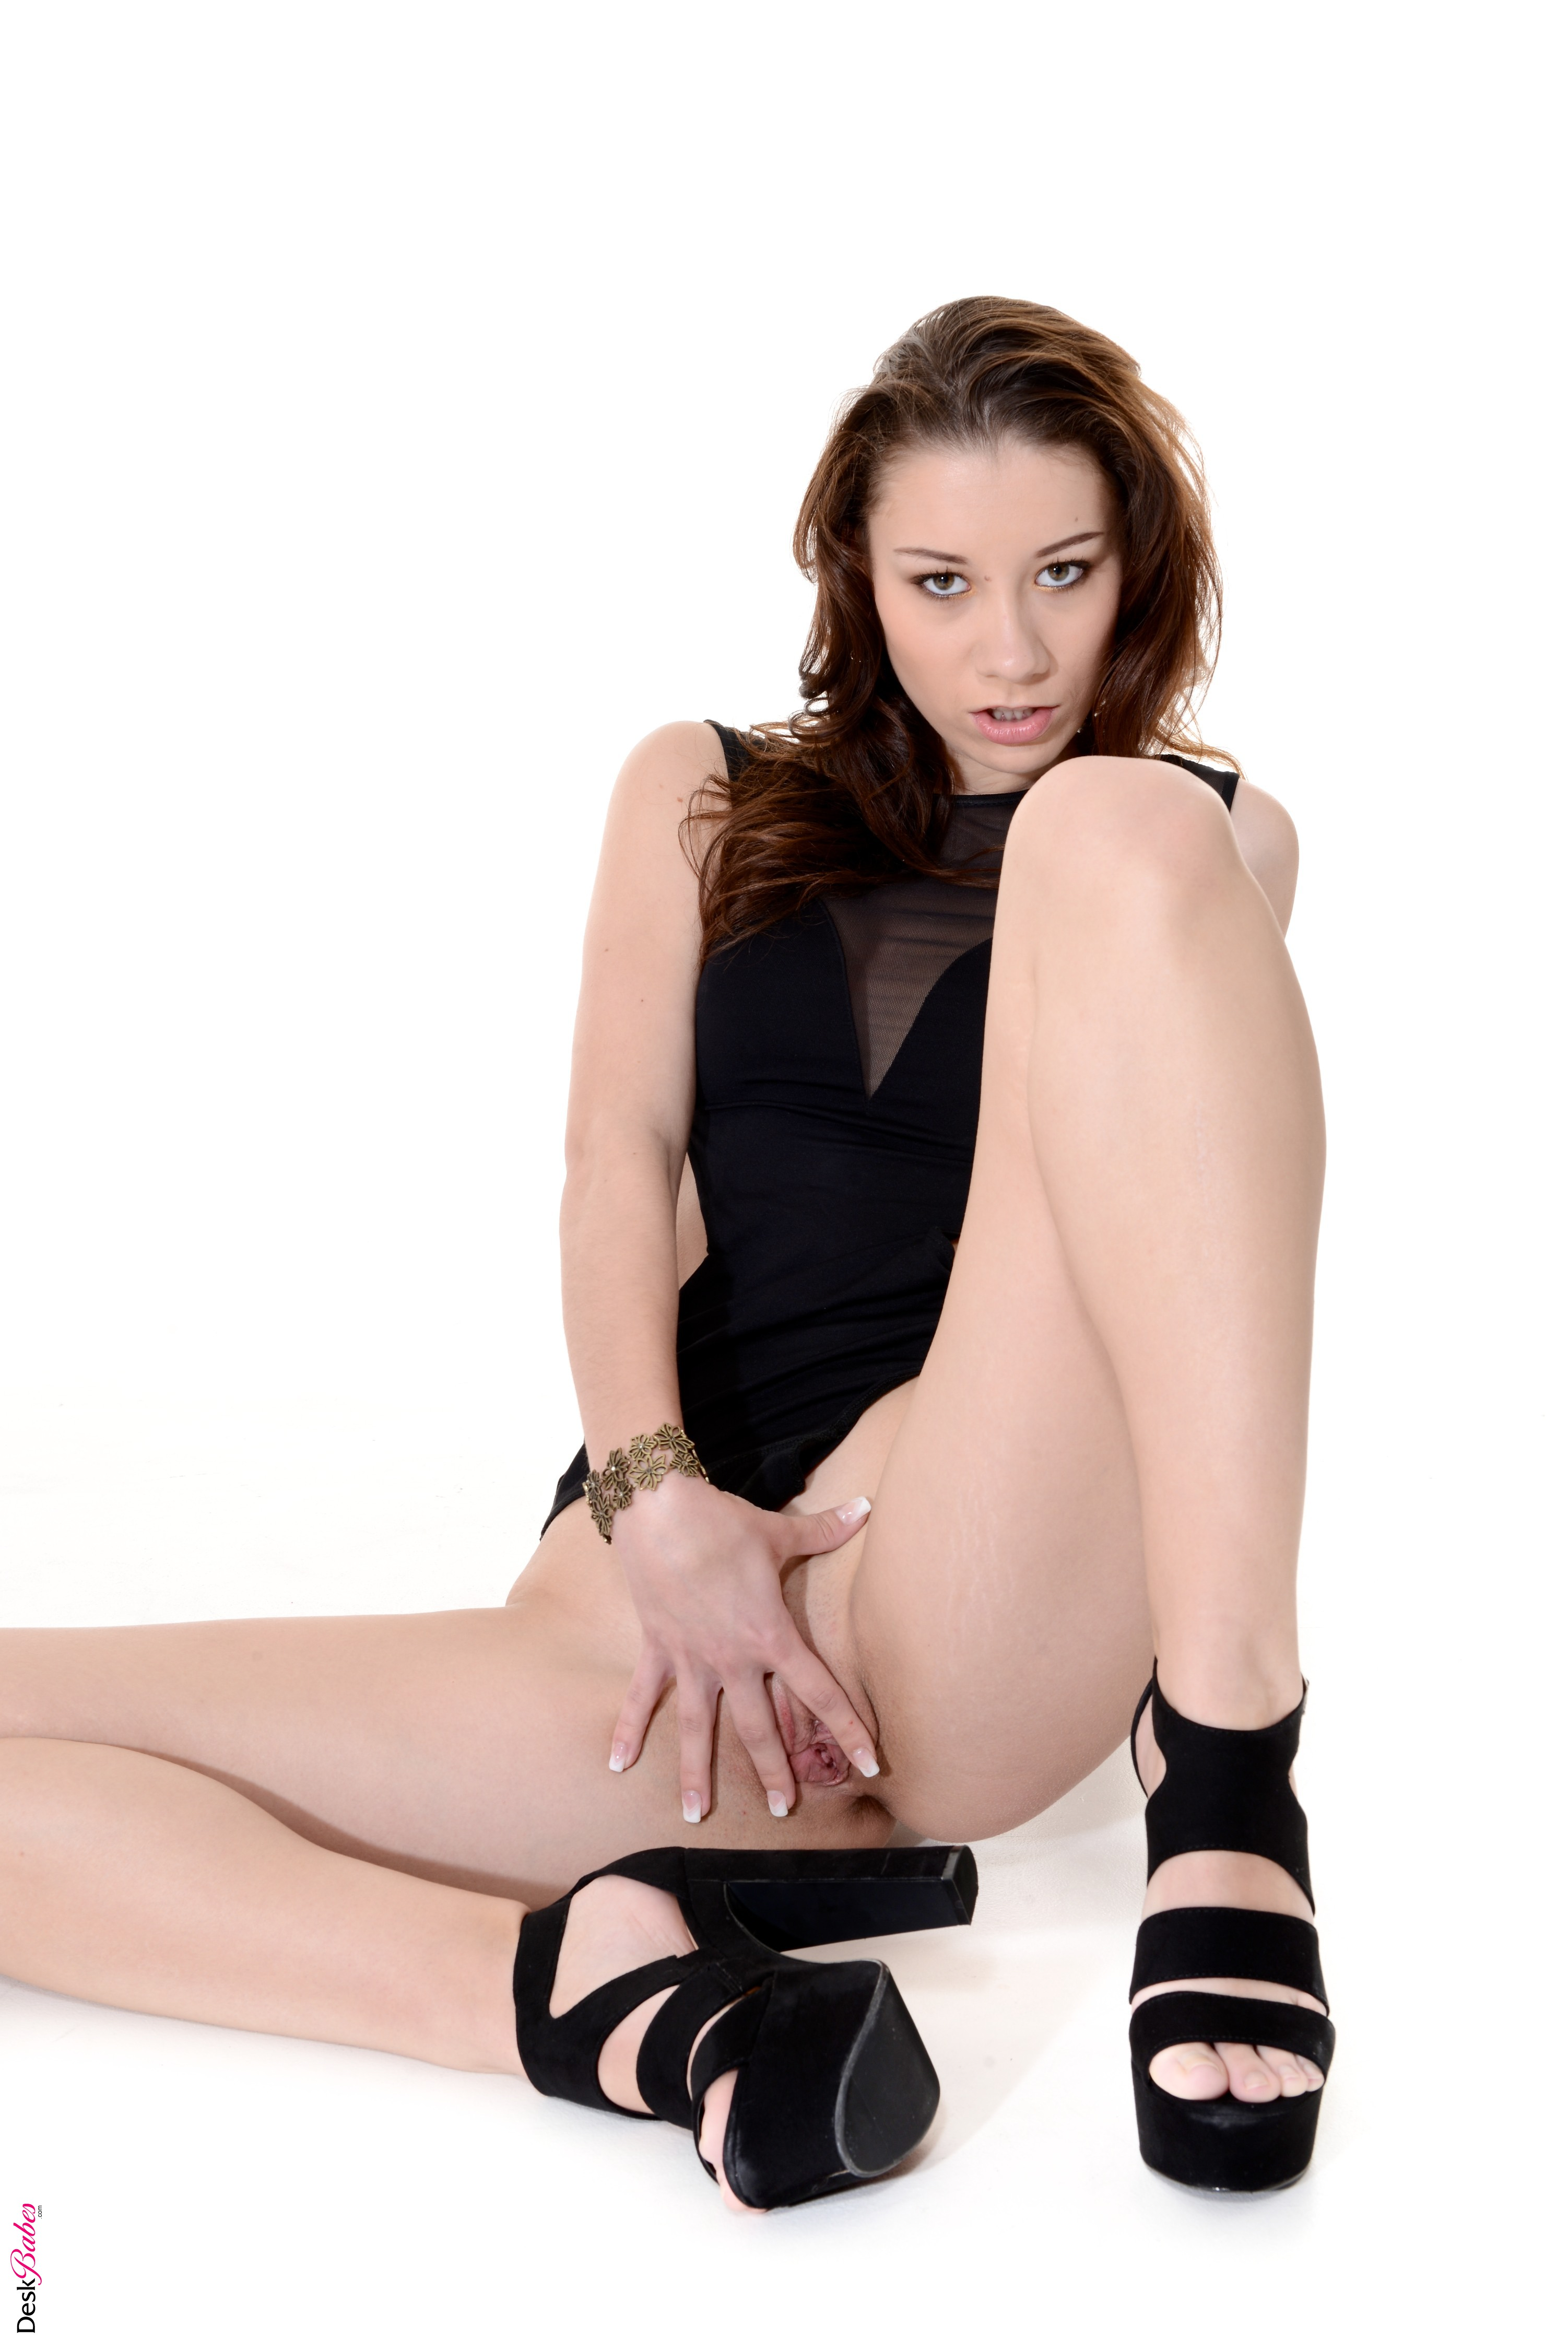 naked girl erotic